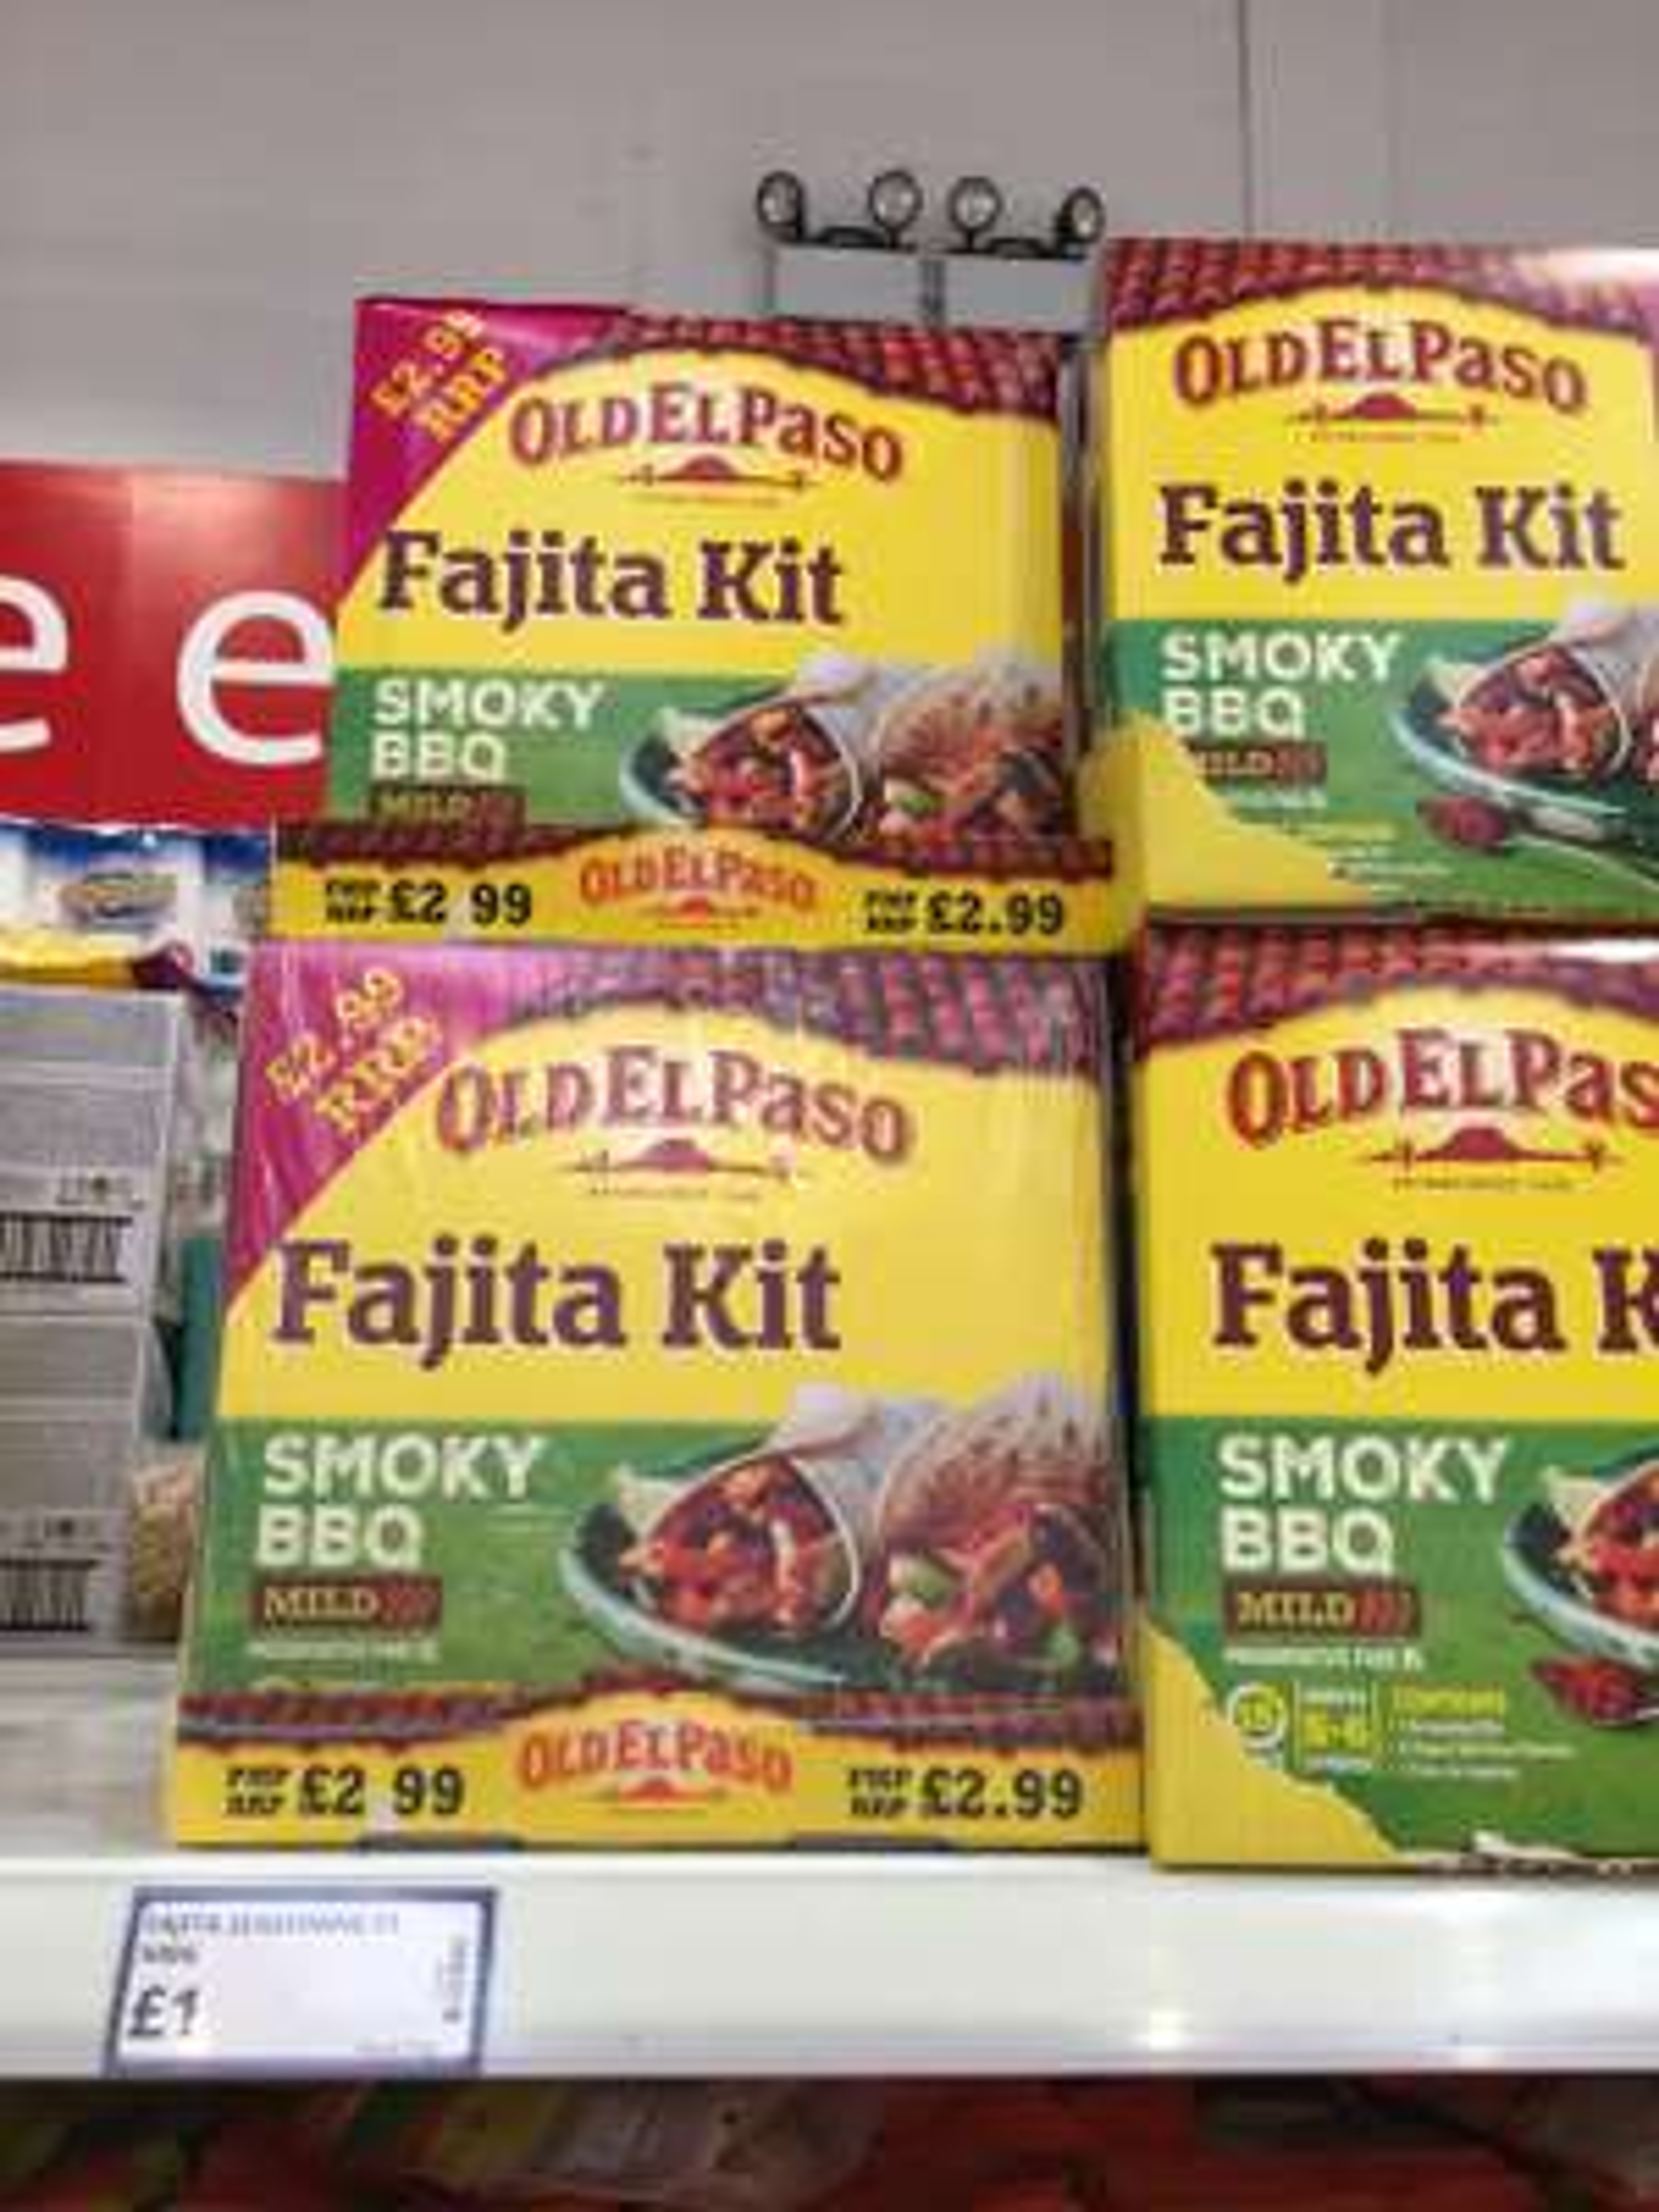 Old El Paso Fajita & Enchilada kits +50% free only £1 at poundstretcher Hulme, Manchester